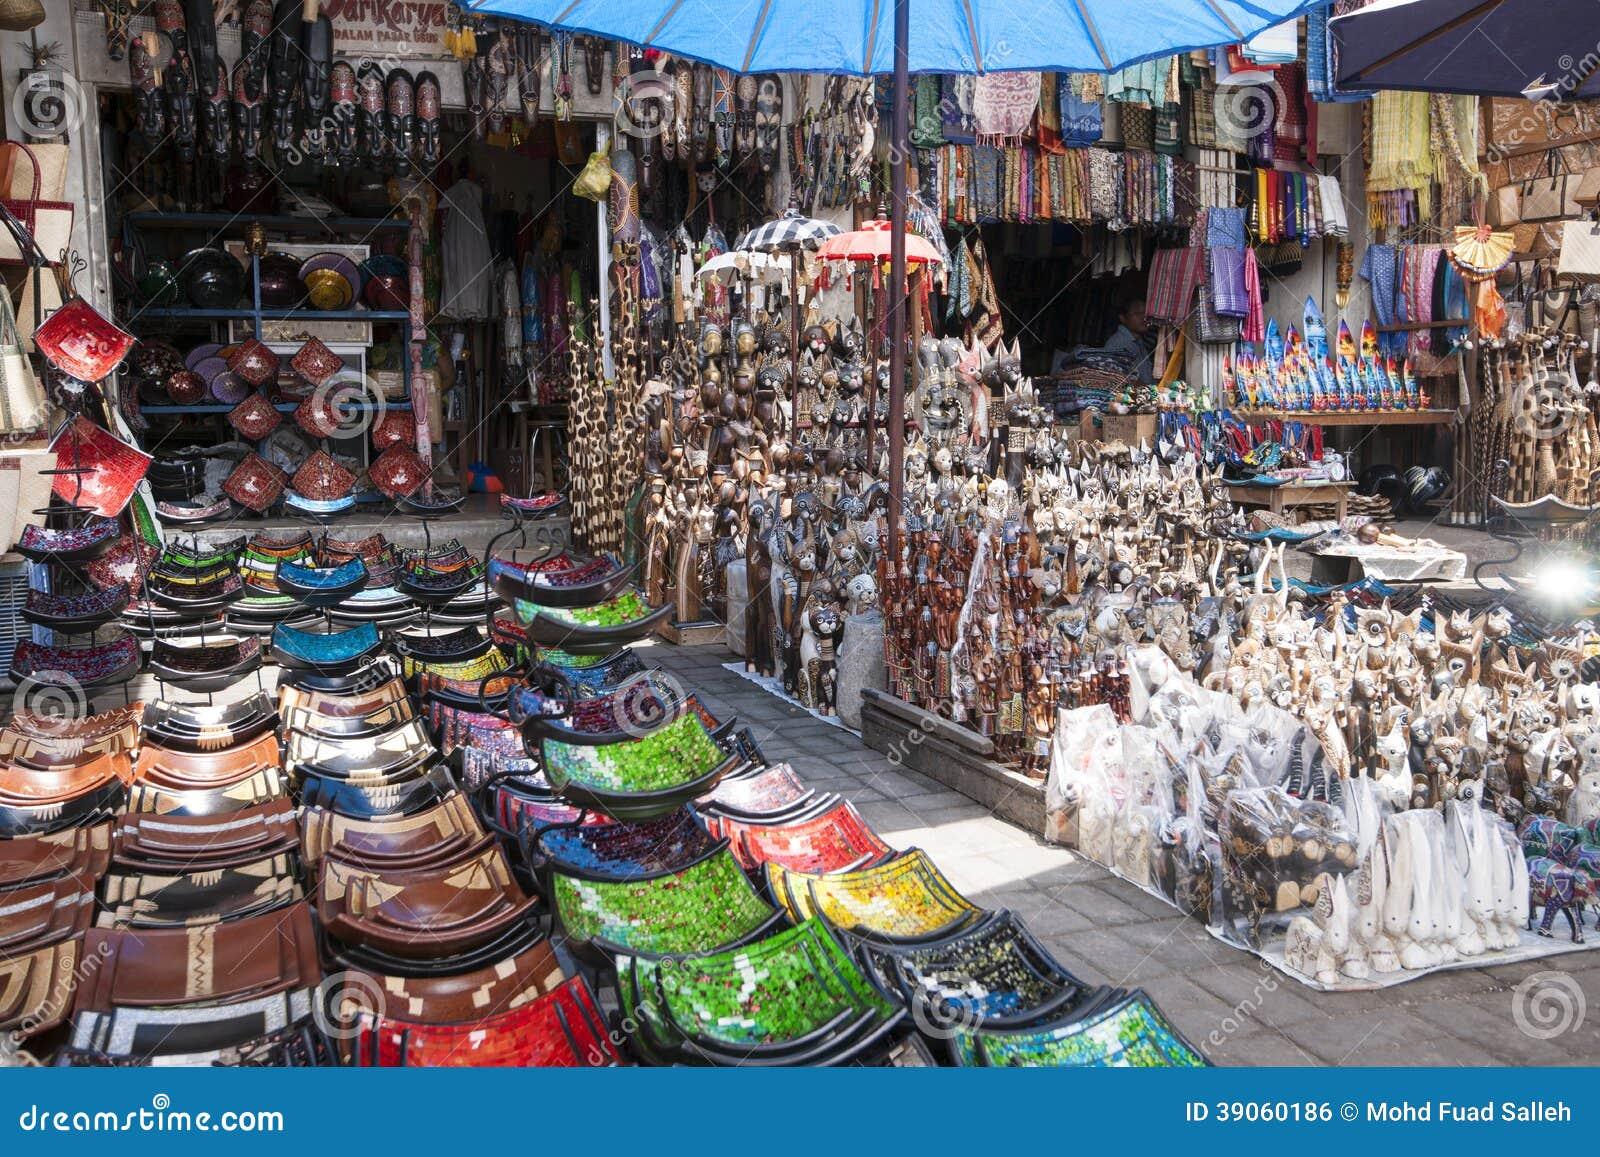 Souvenirs At Ubud Market Editorial Photo - Image: 39060186